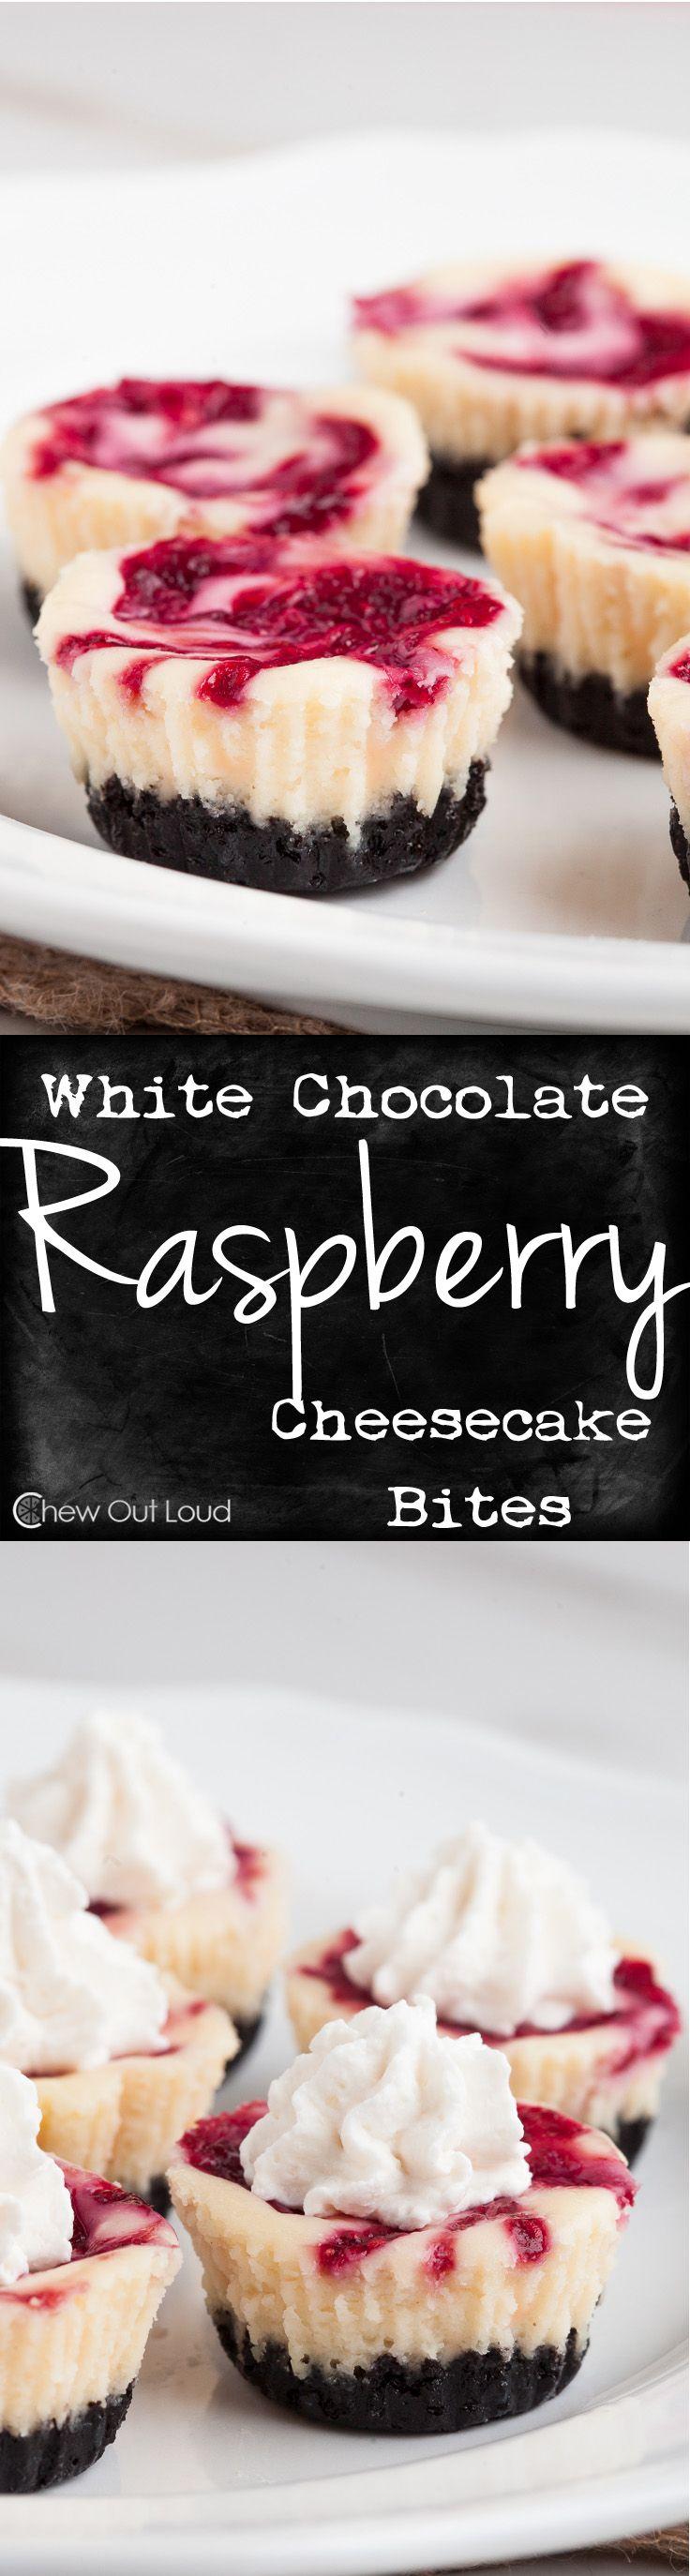 White Chocolate Raspberry Cheesecakes Bites Recipe